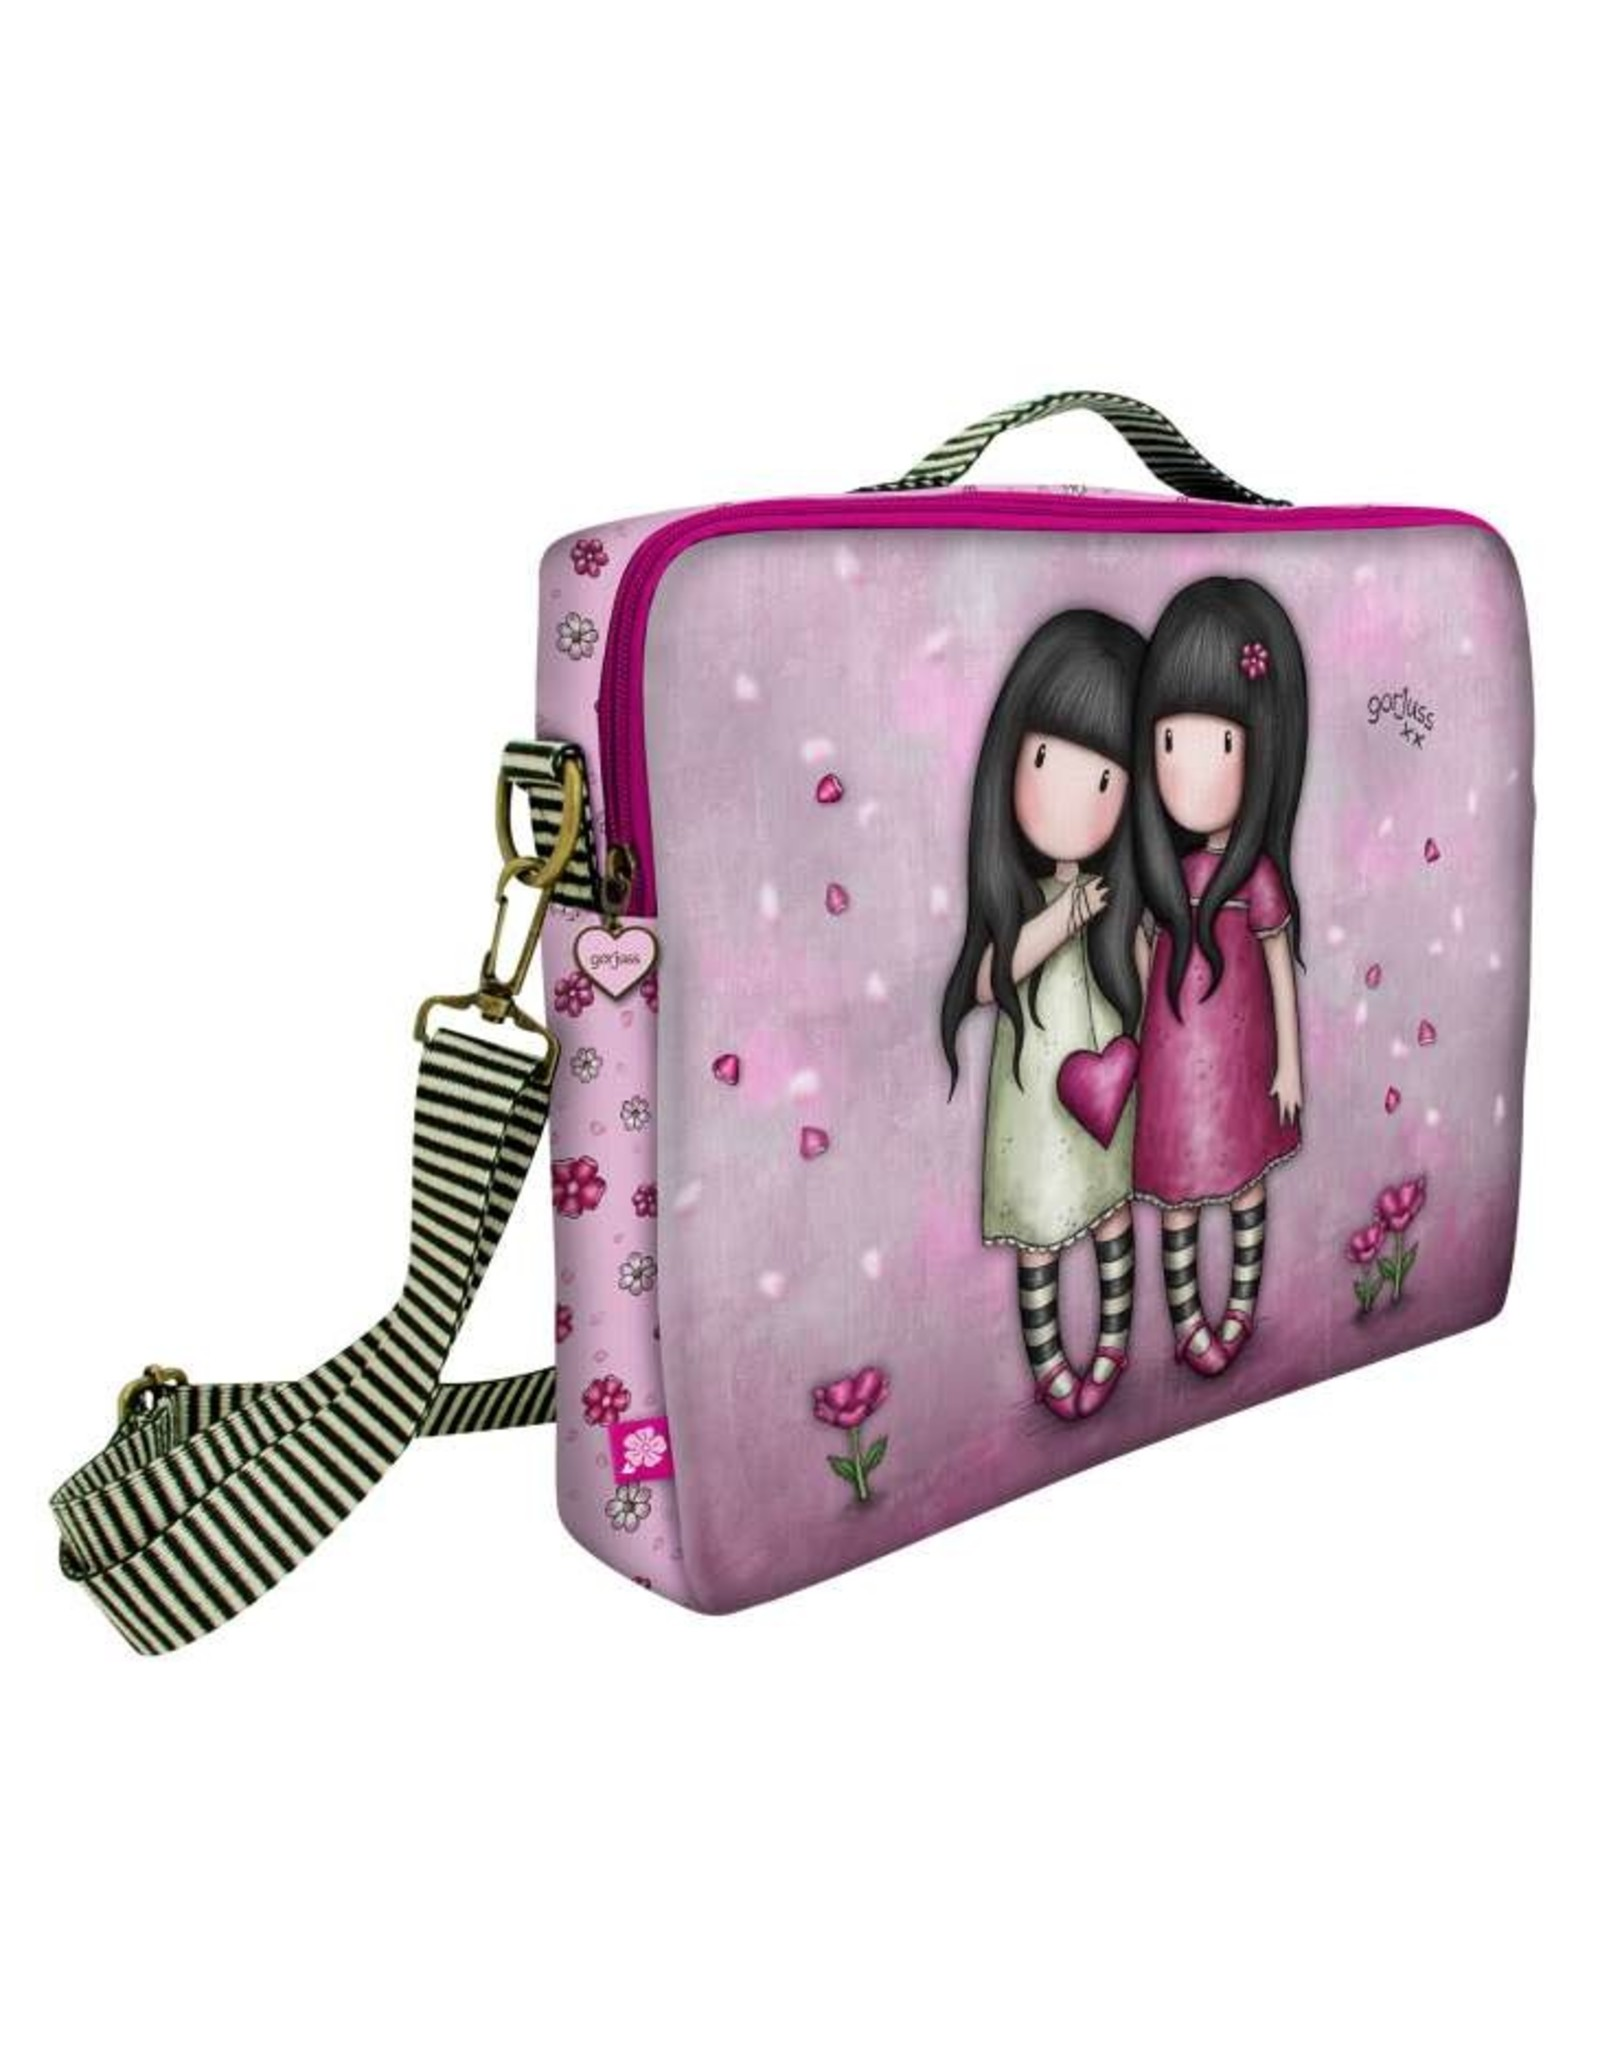 "Santoro GORJUSS Laptop bag 15"" - You Can Have Mine"